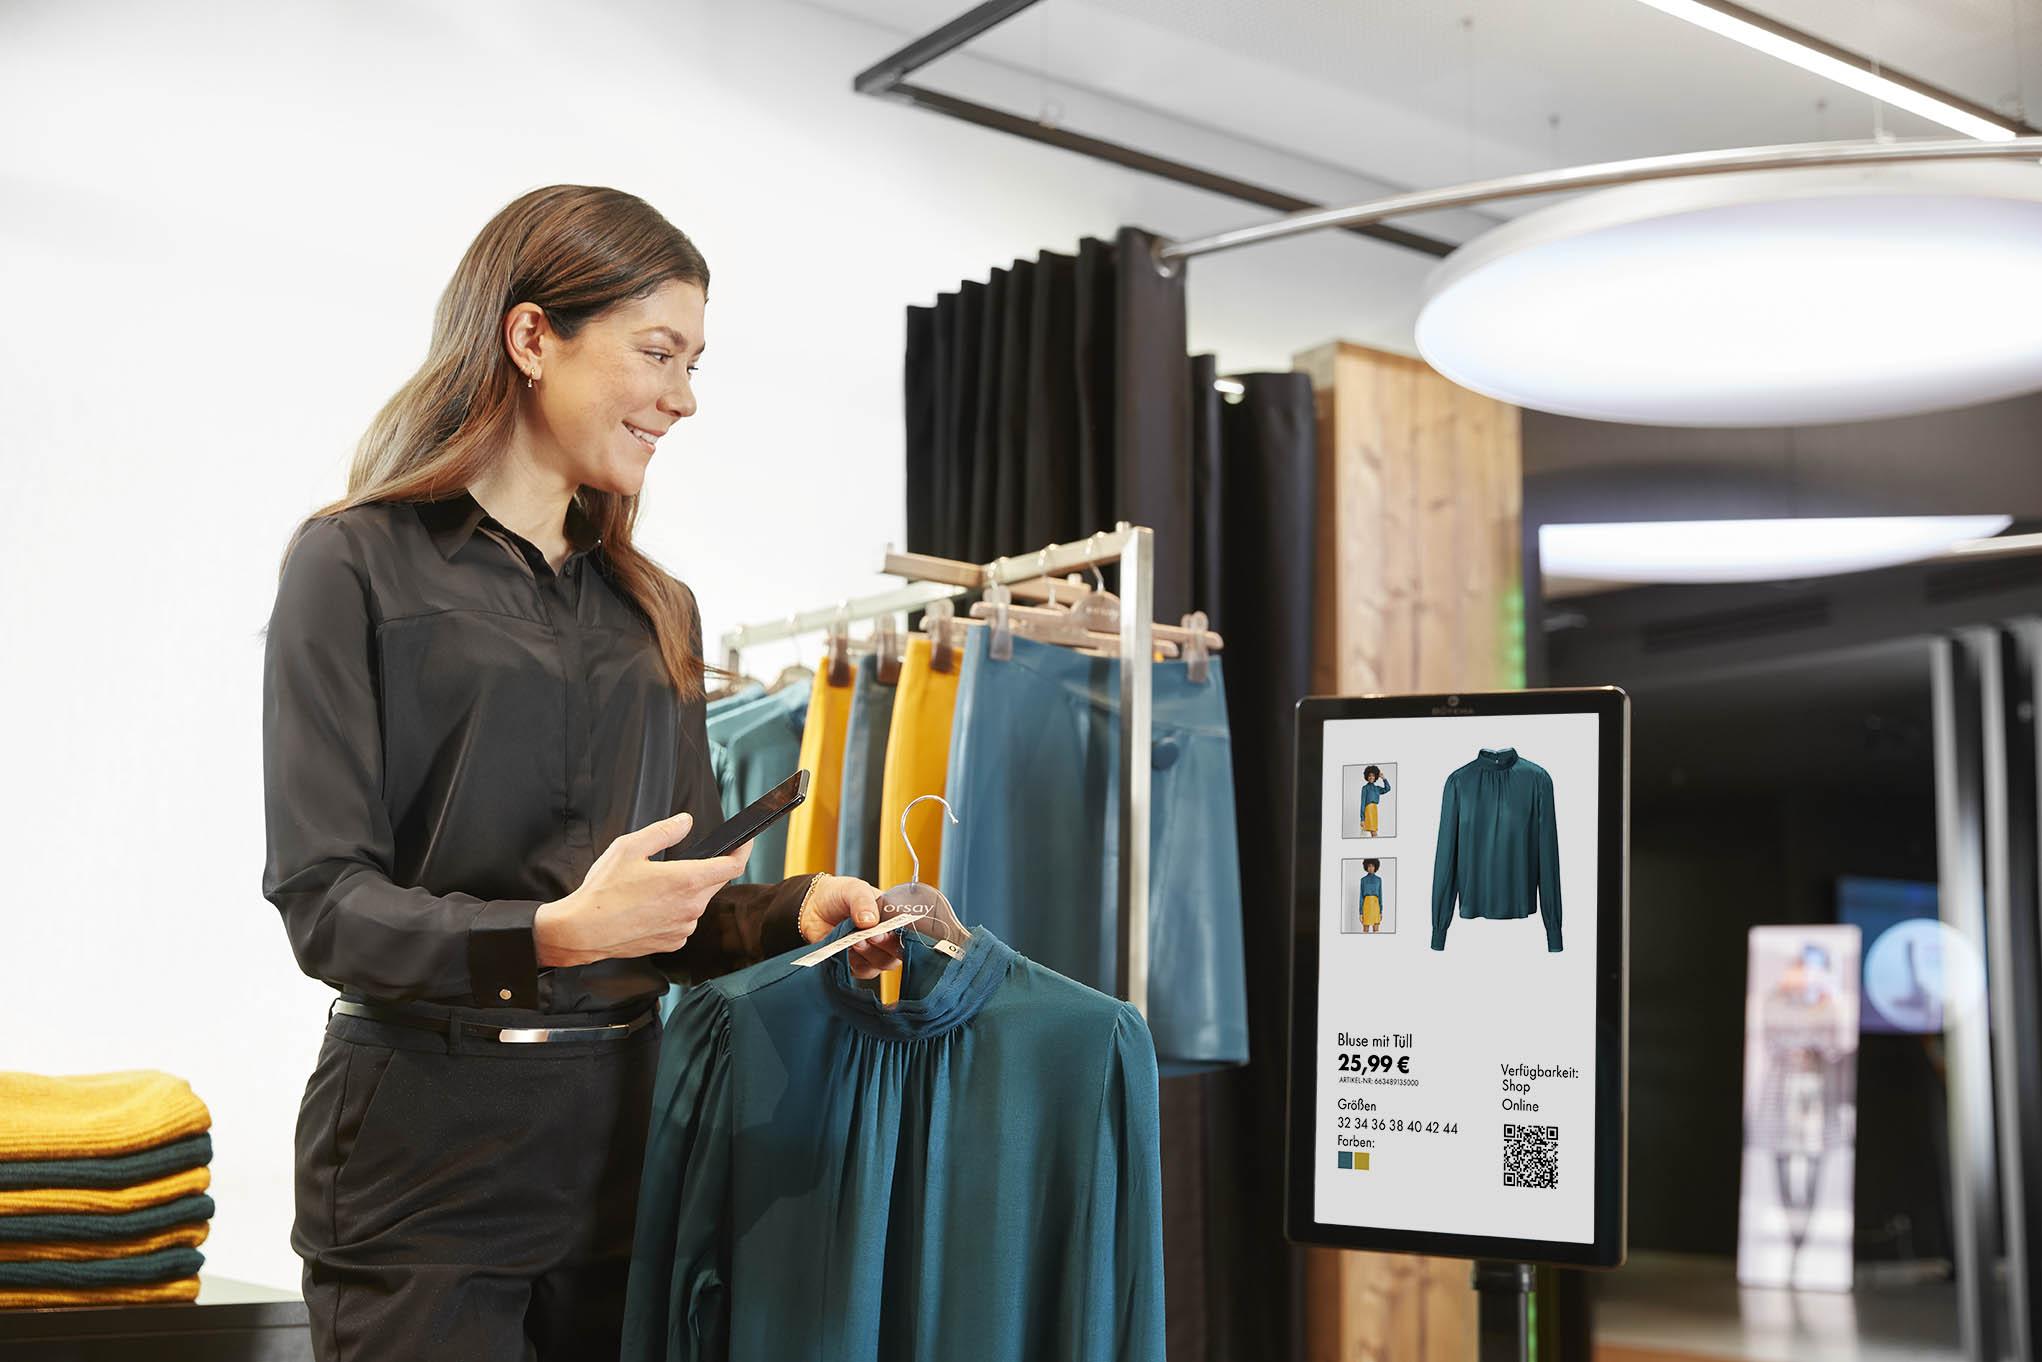 Verkäuferin bedient Digital Counter Card mit dem InStore Assistant